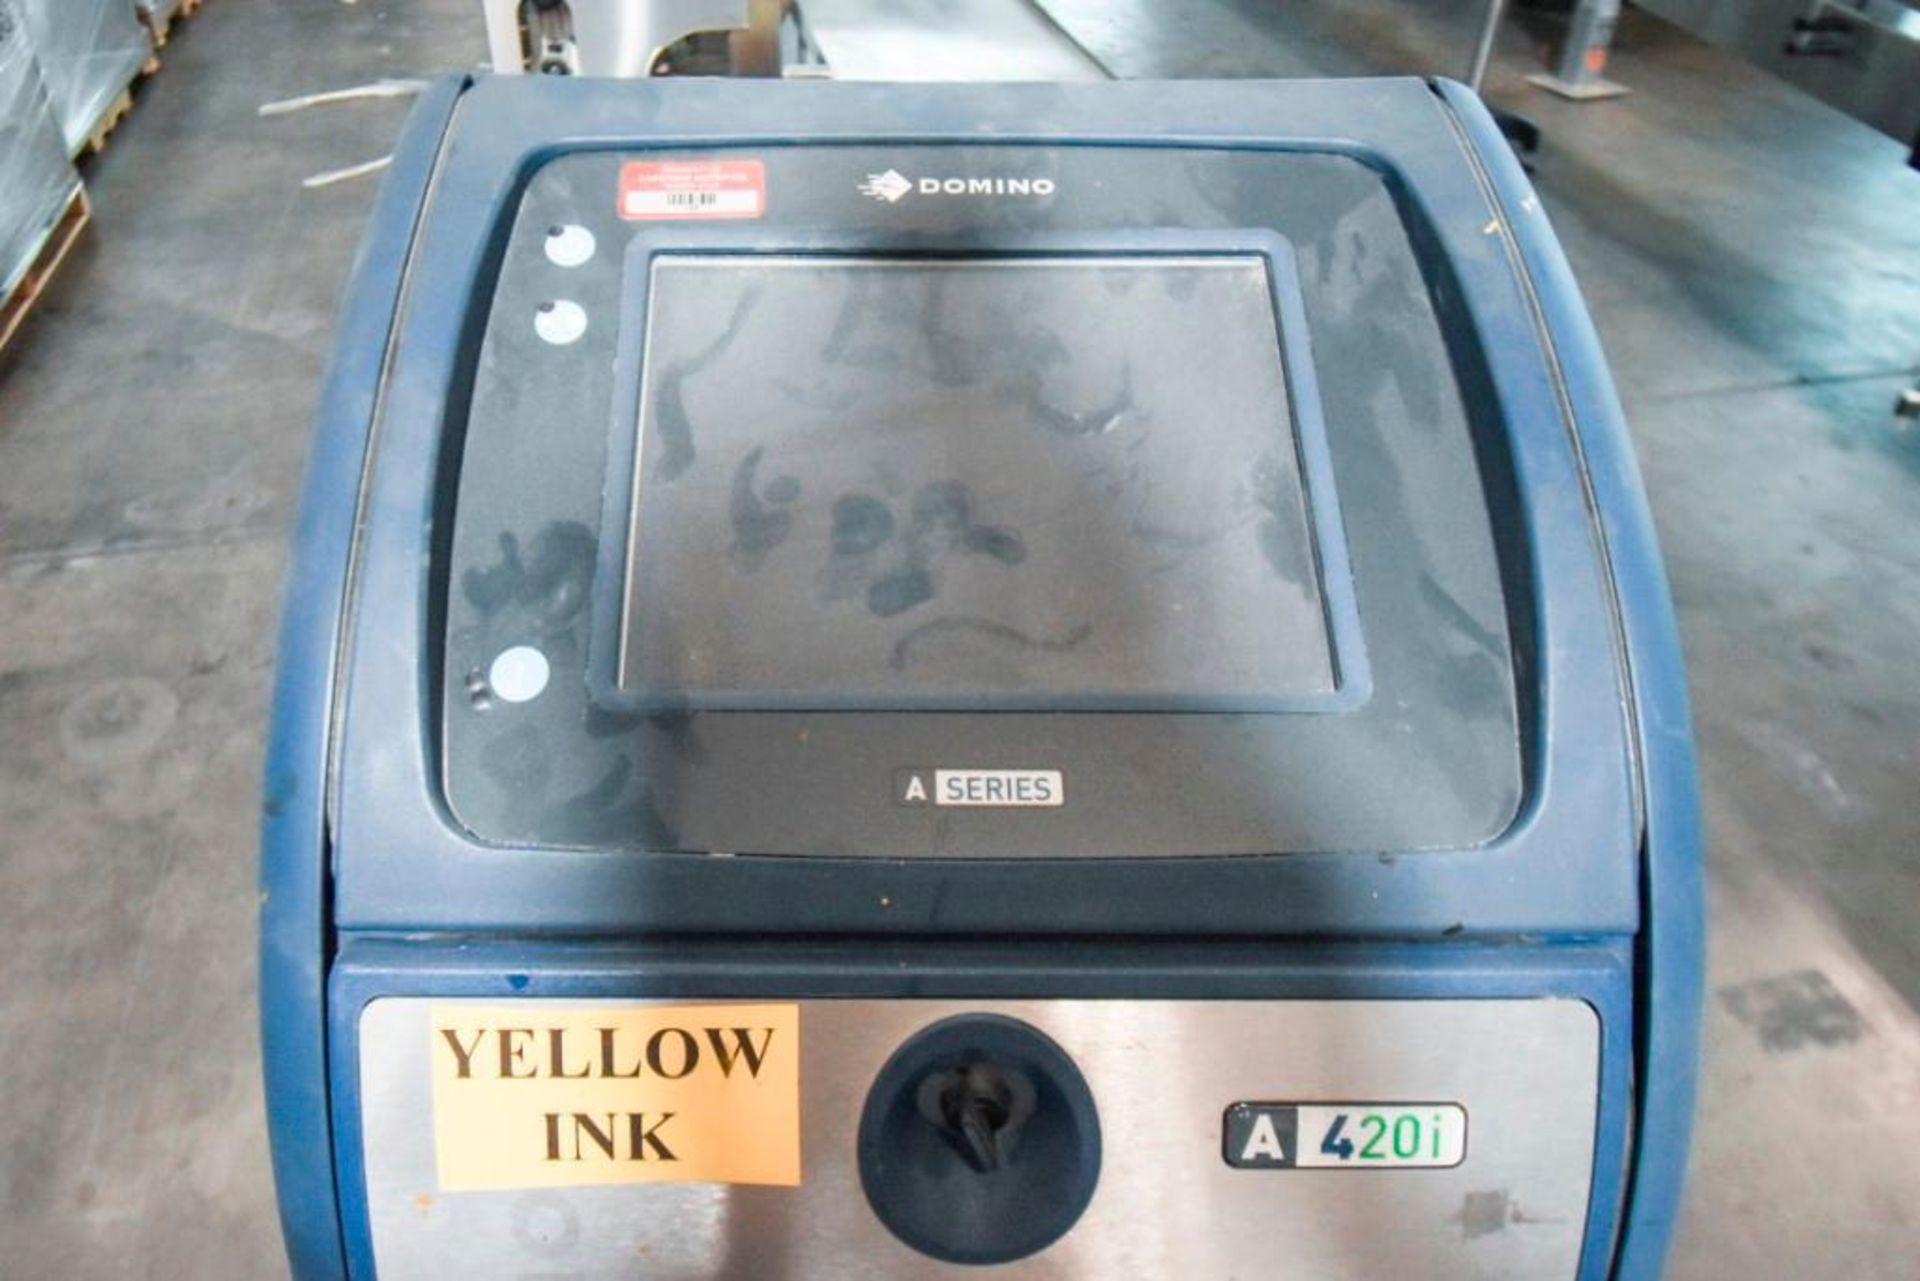 Domino A420i Printers - Image 4 of 21